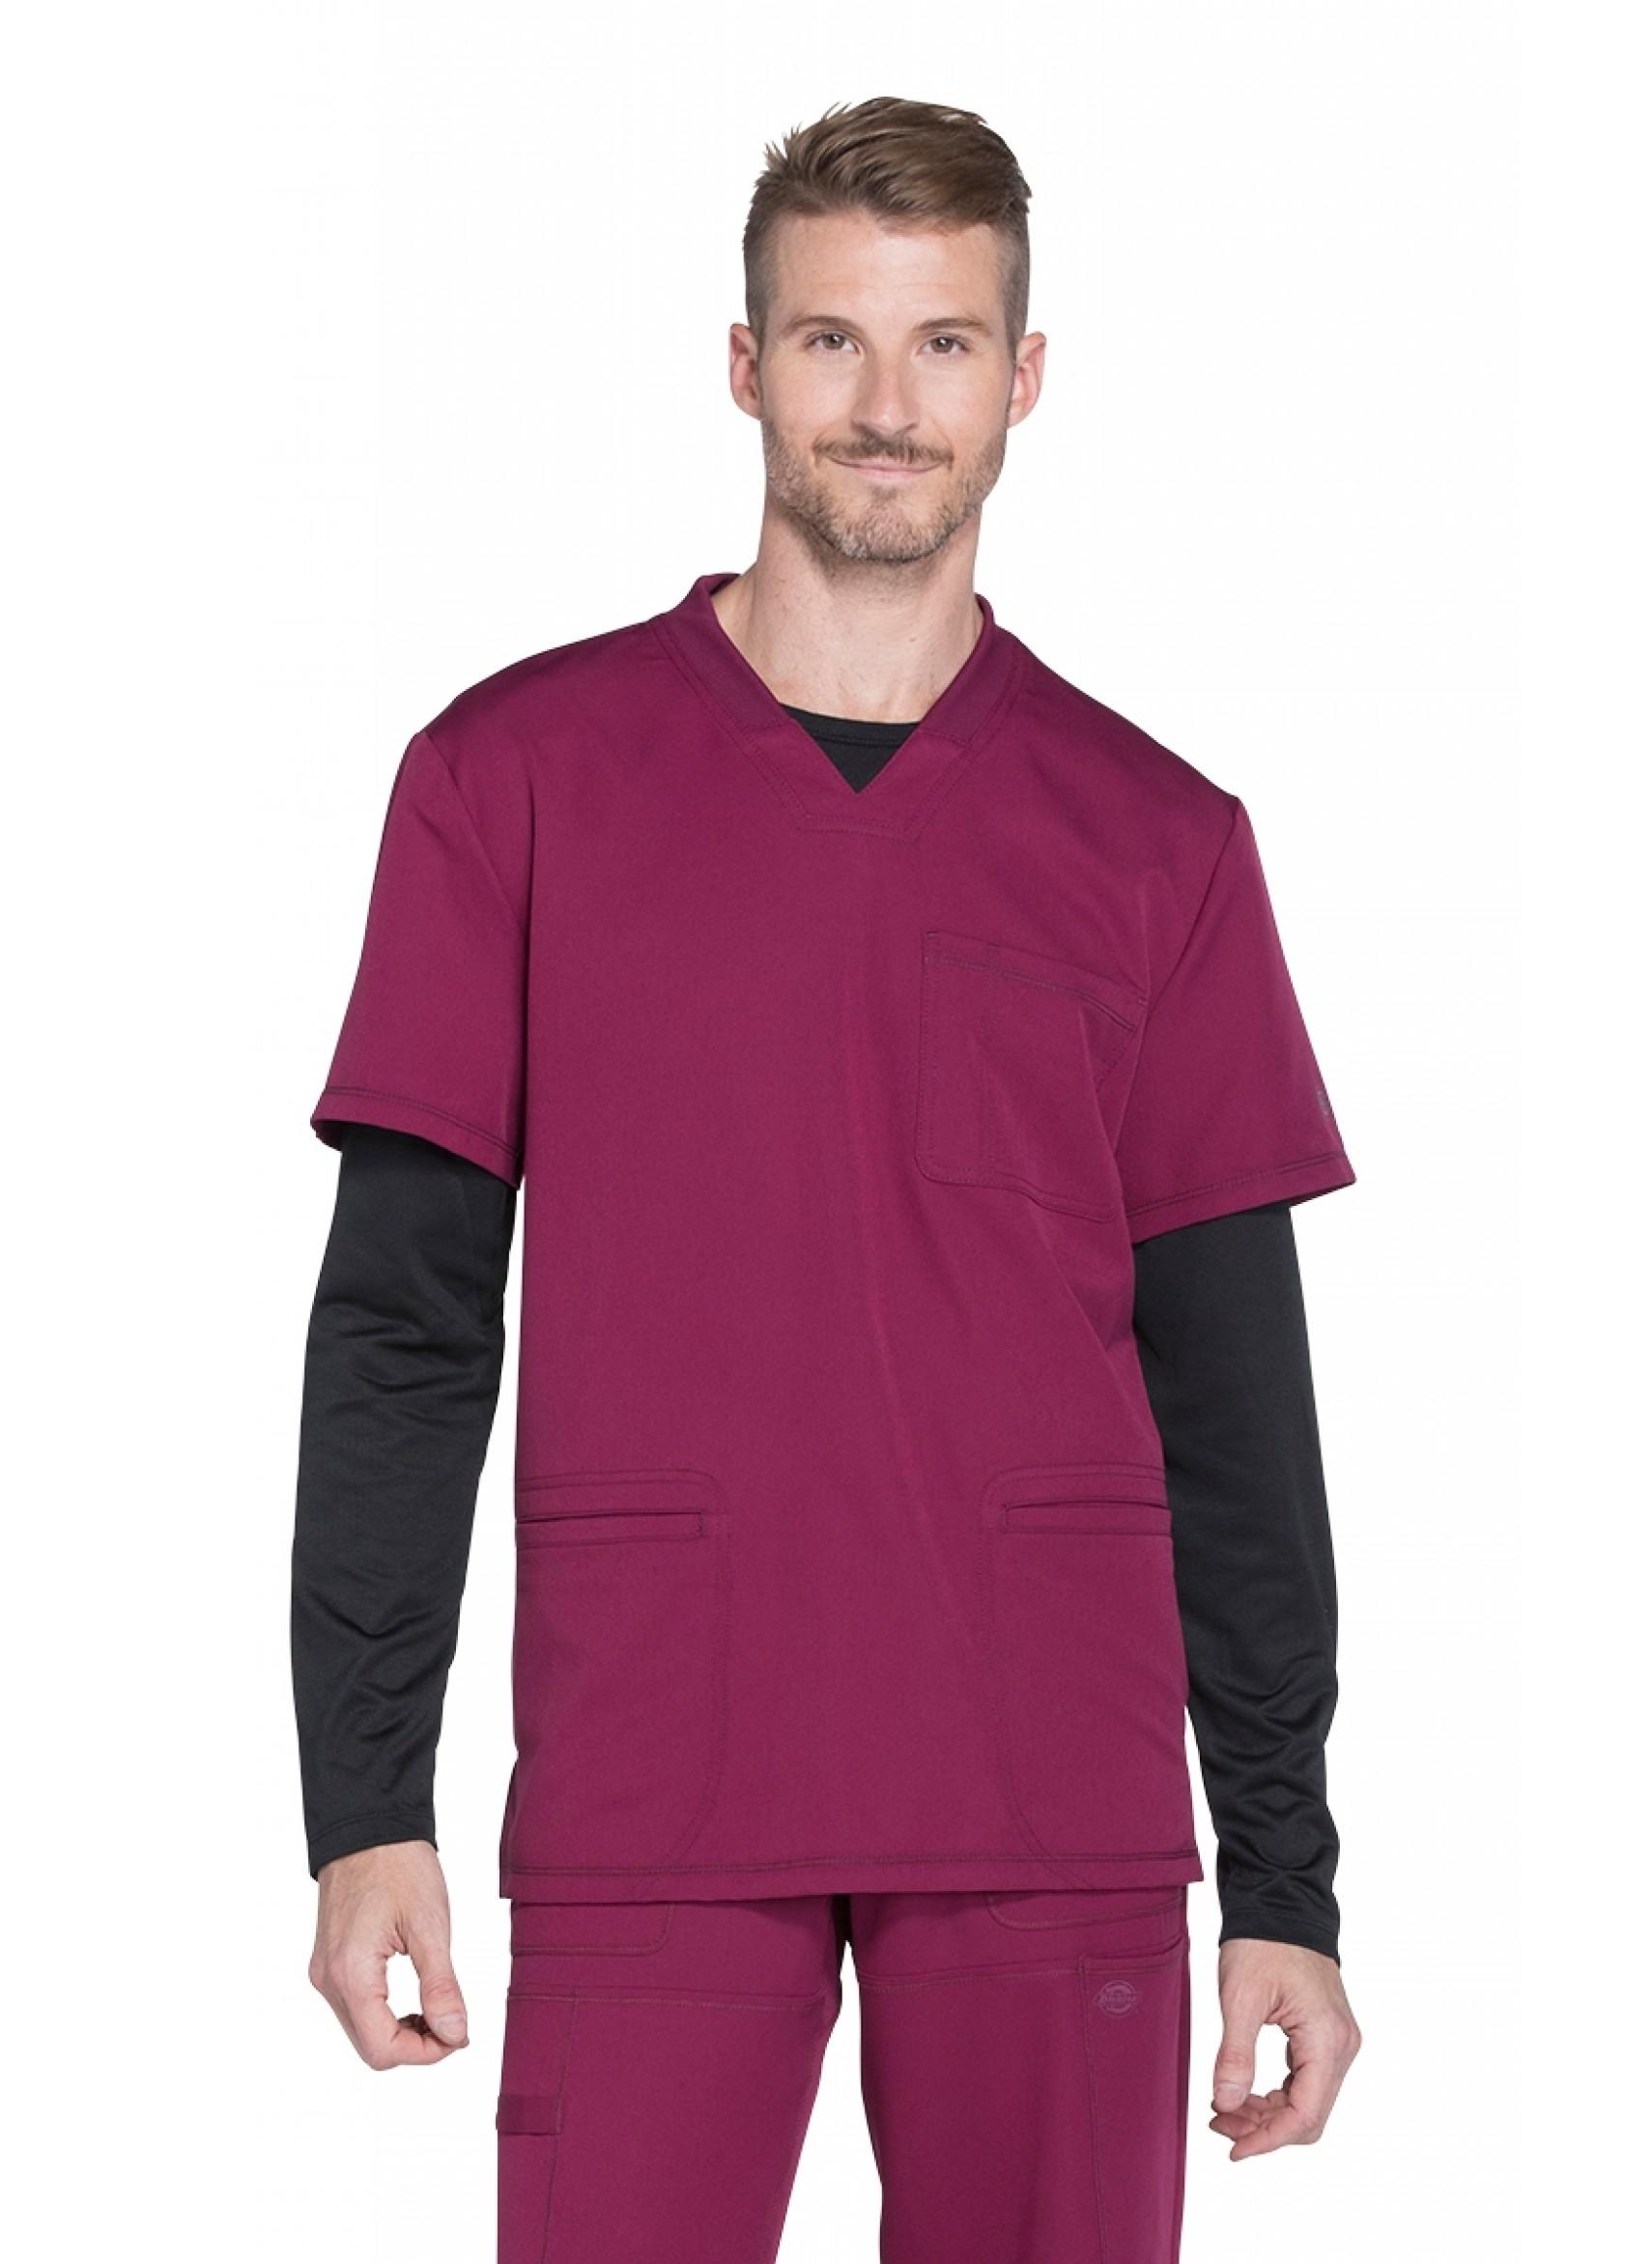 8f2c097607 Dickies Dynamix Men's V-Neck Scrub Top with Pockets - DK640 | Murse ...